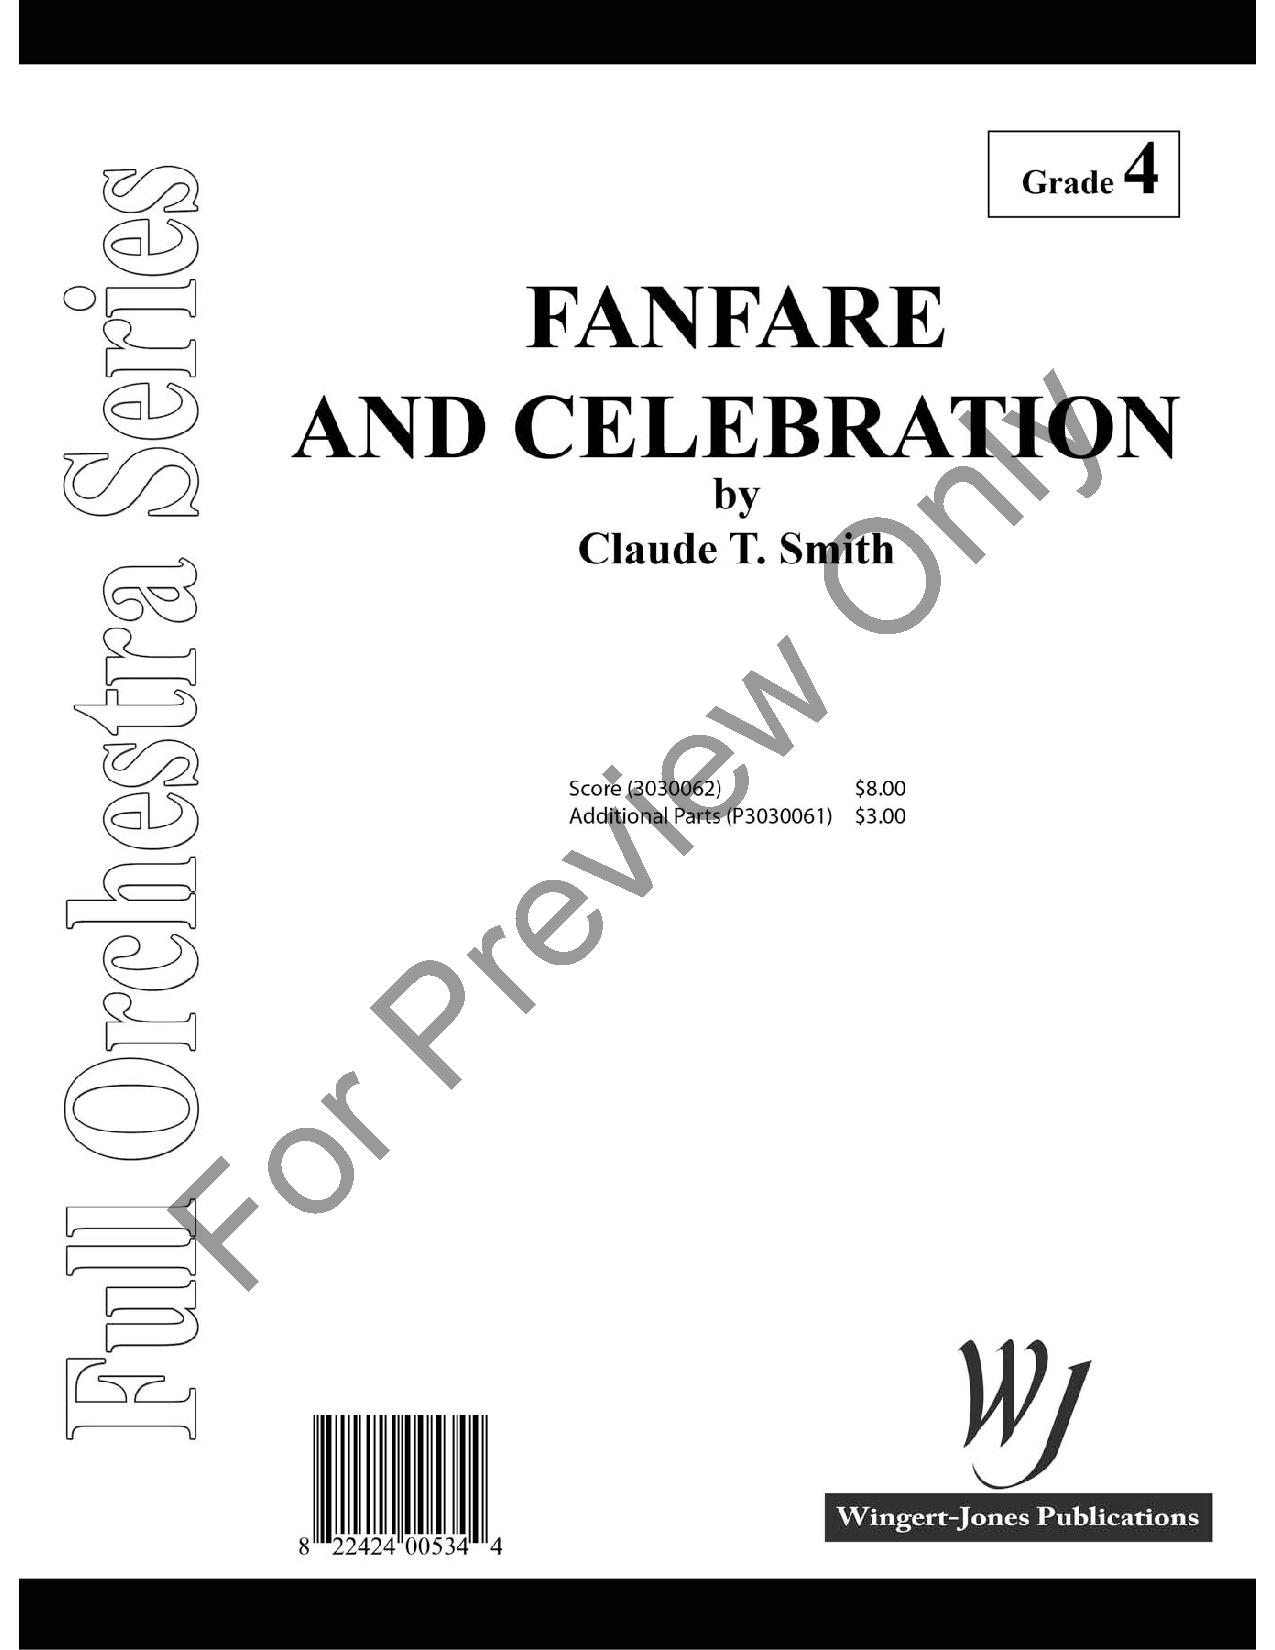 Fanfare and Celebration Thumbnail